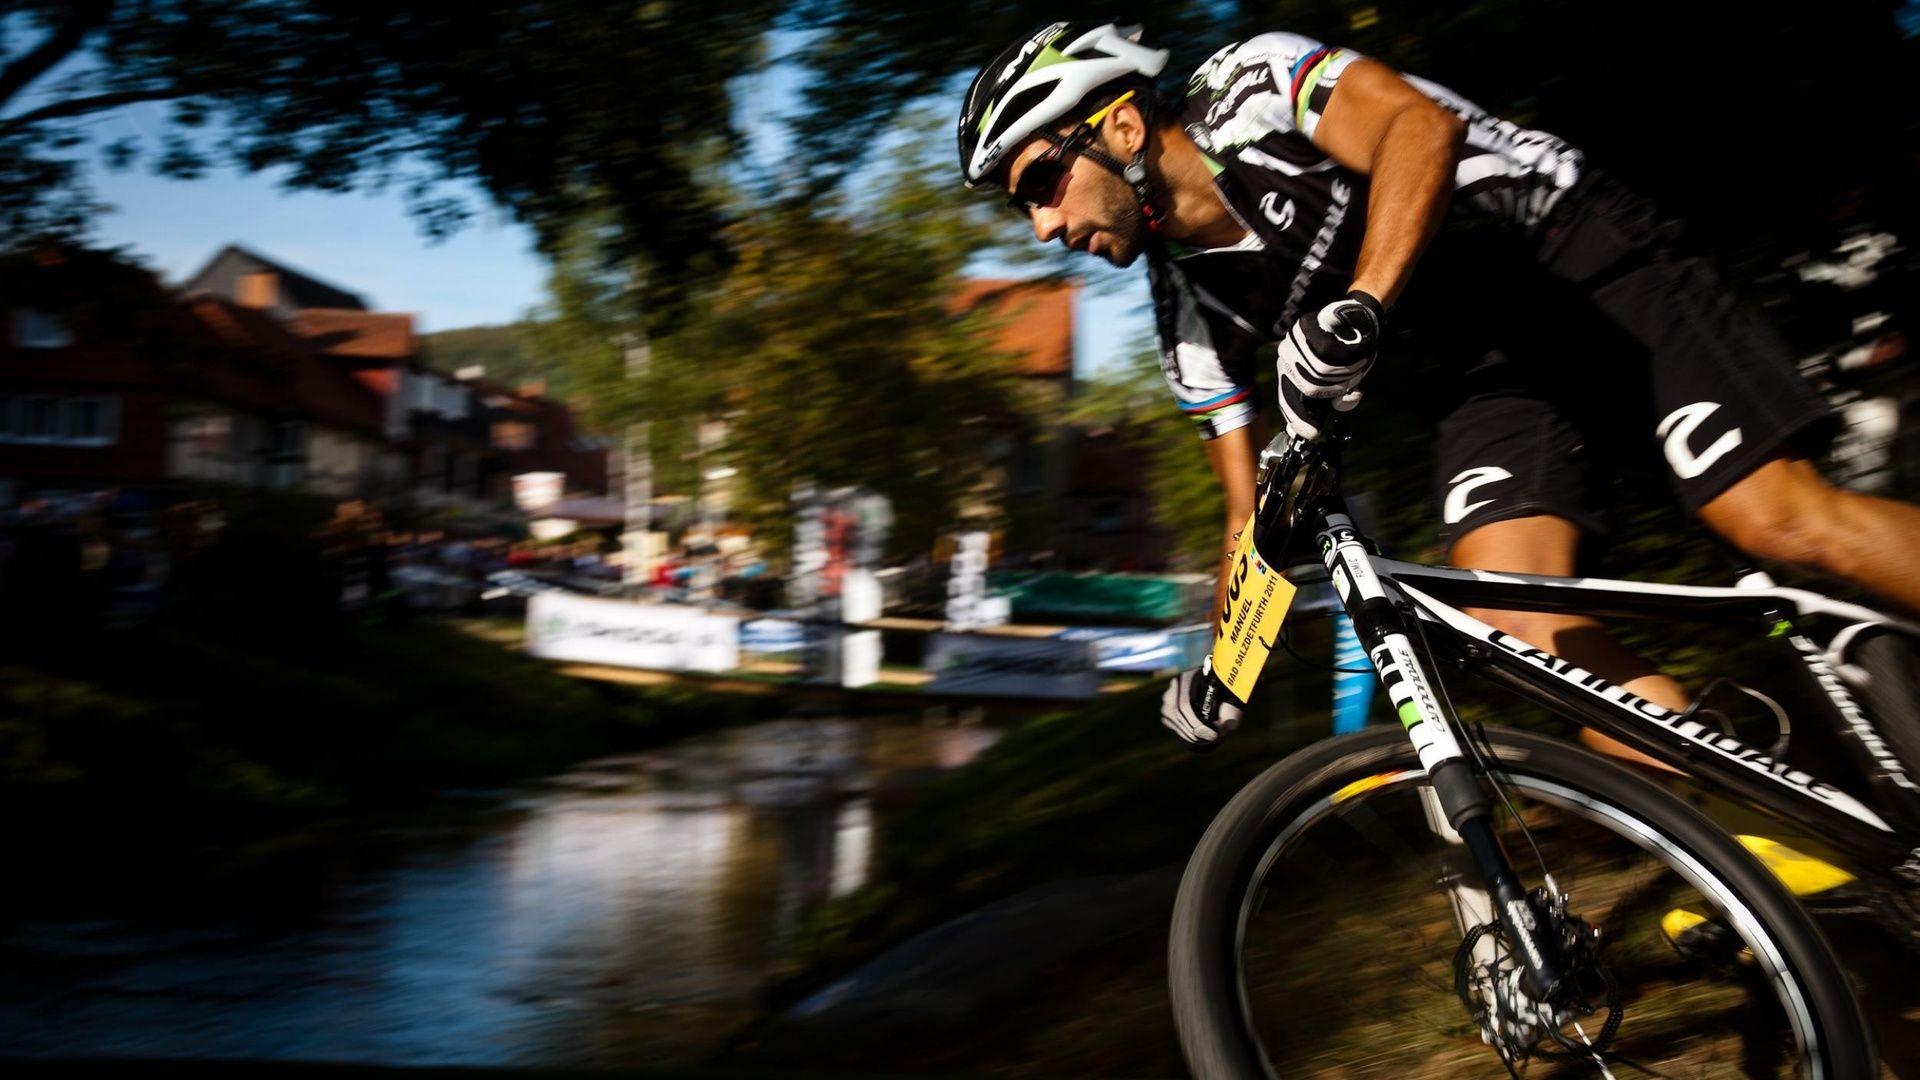 Cycling HD 1080 wallpaper